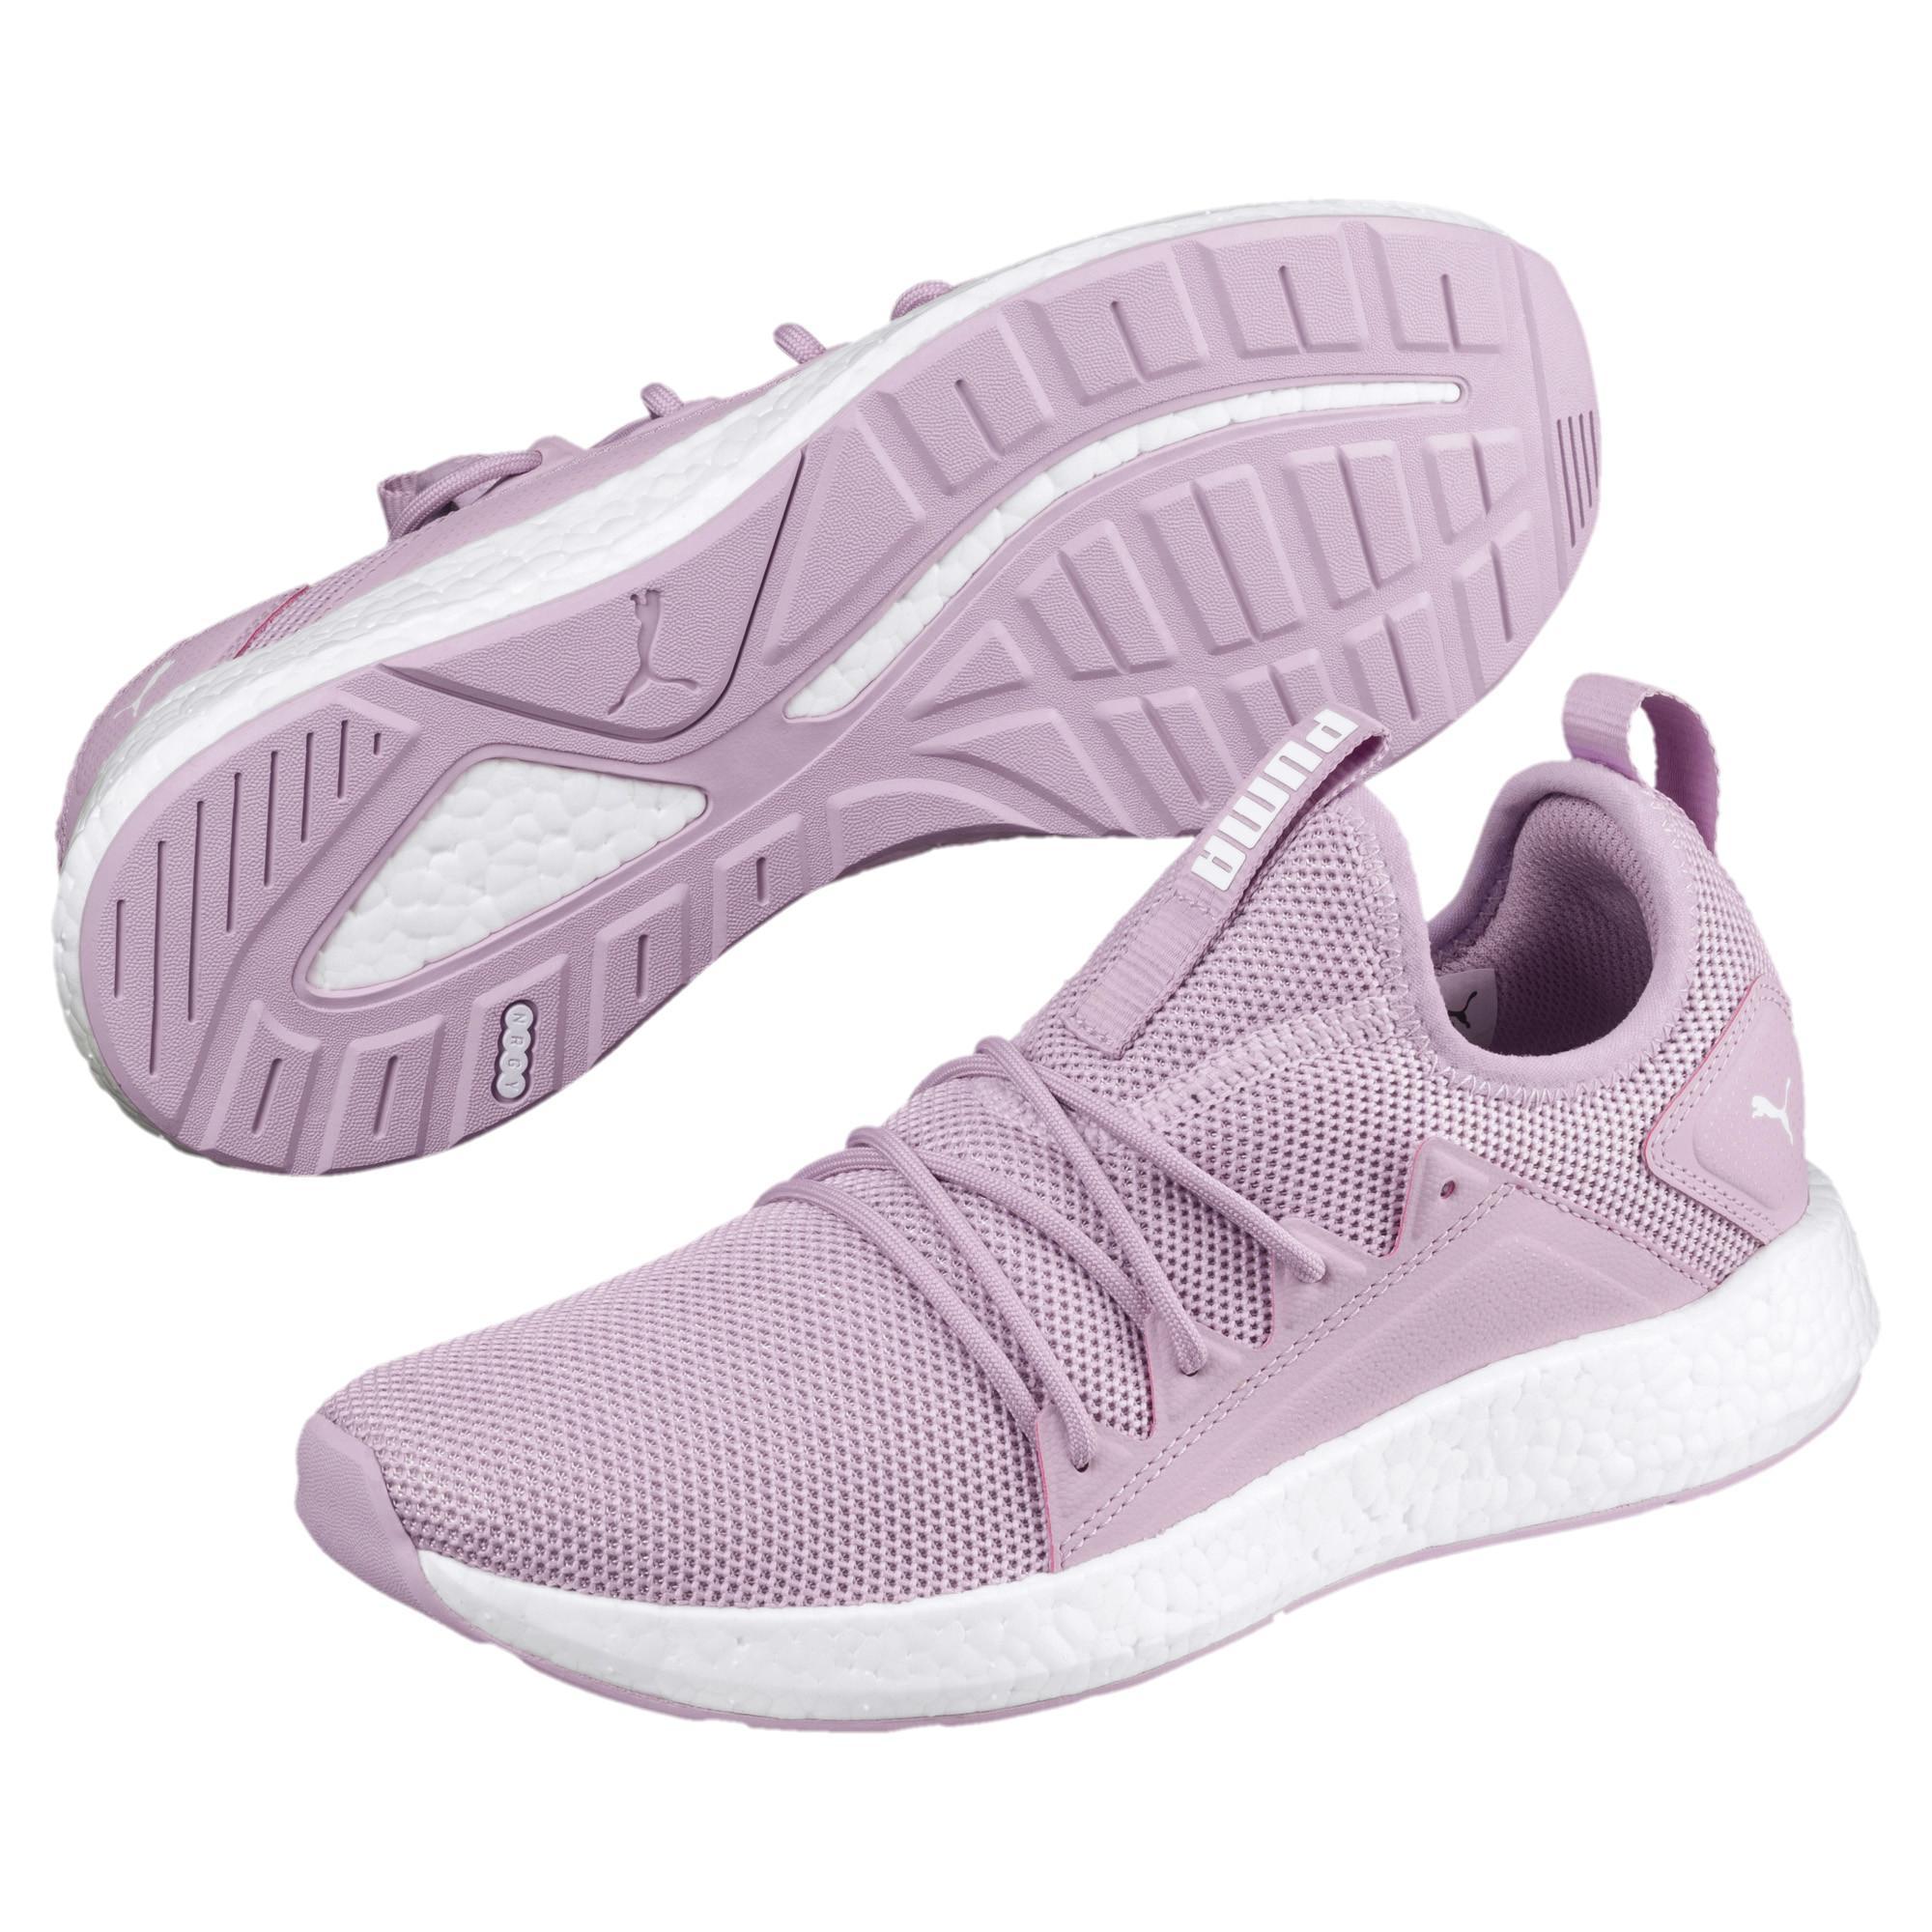 PUMA - Purple Nrgy Neko Women s Sneakers - Lyst. View fullscreen 1d823bc73